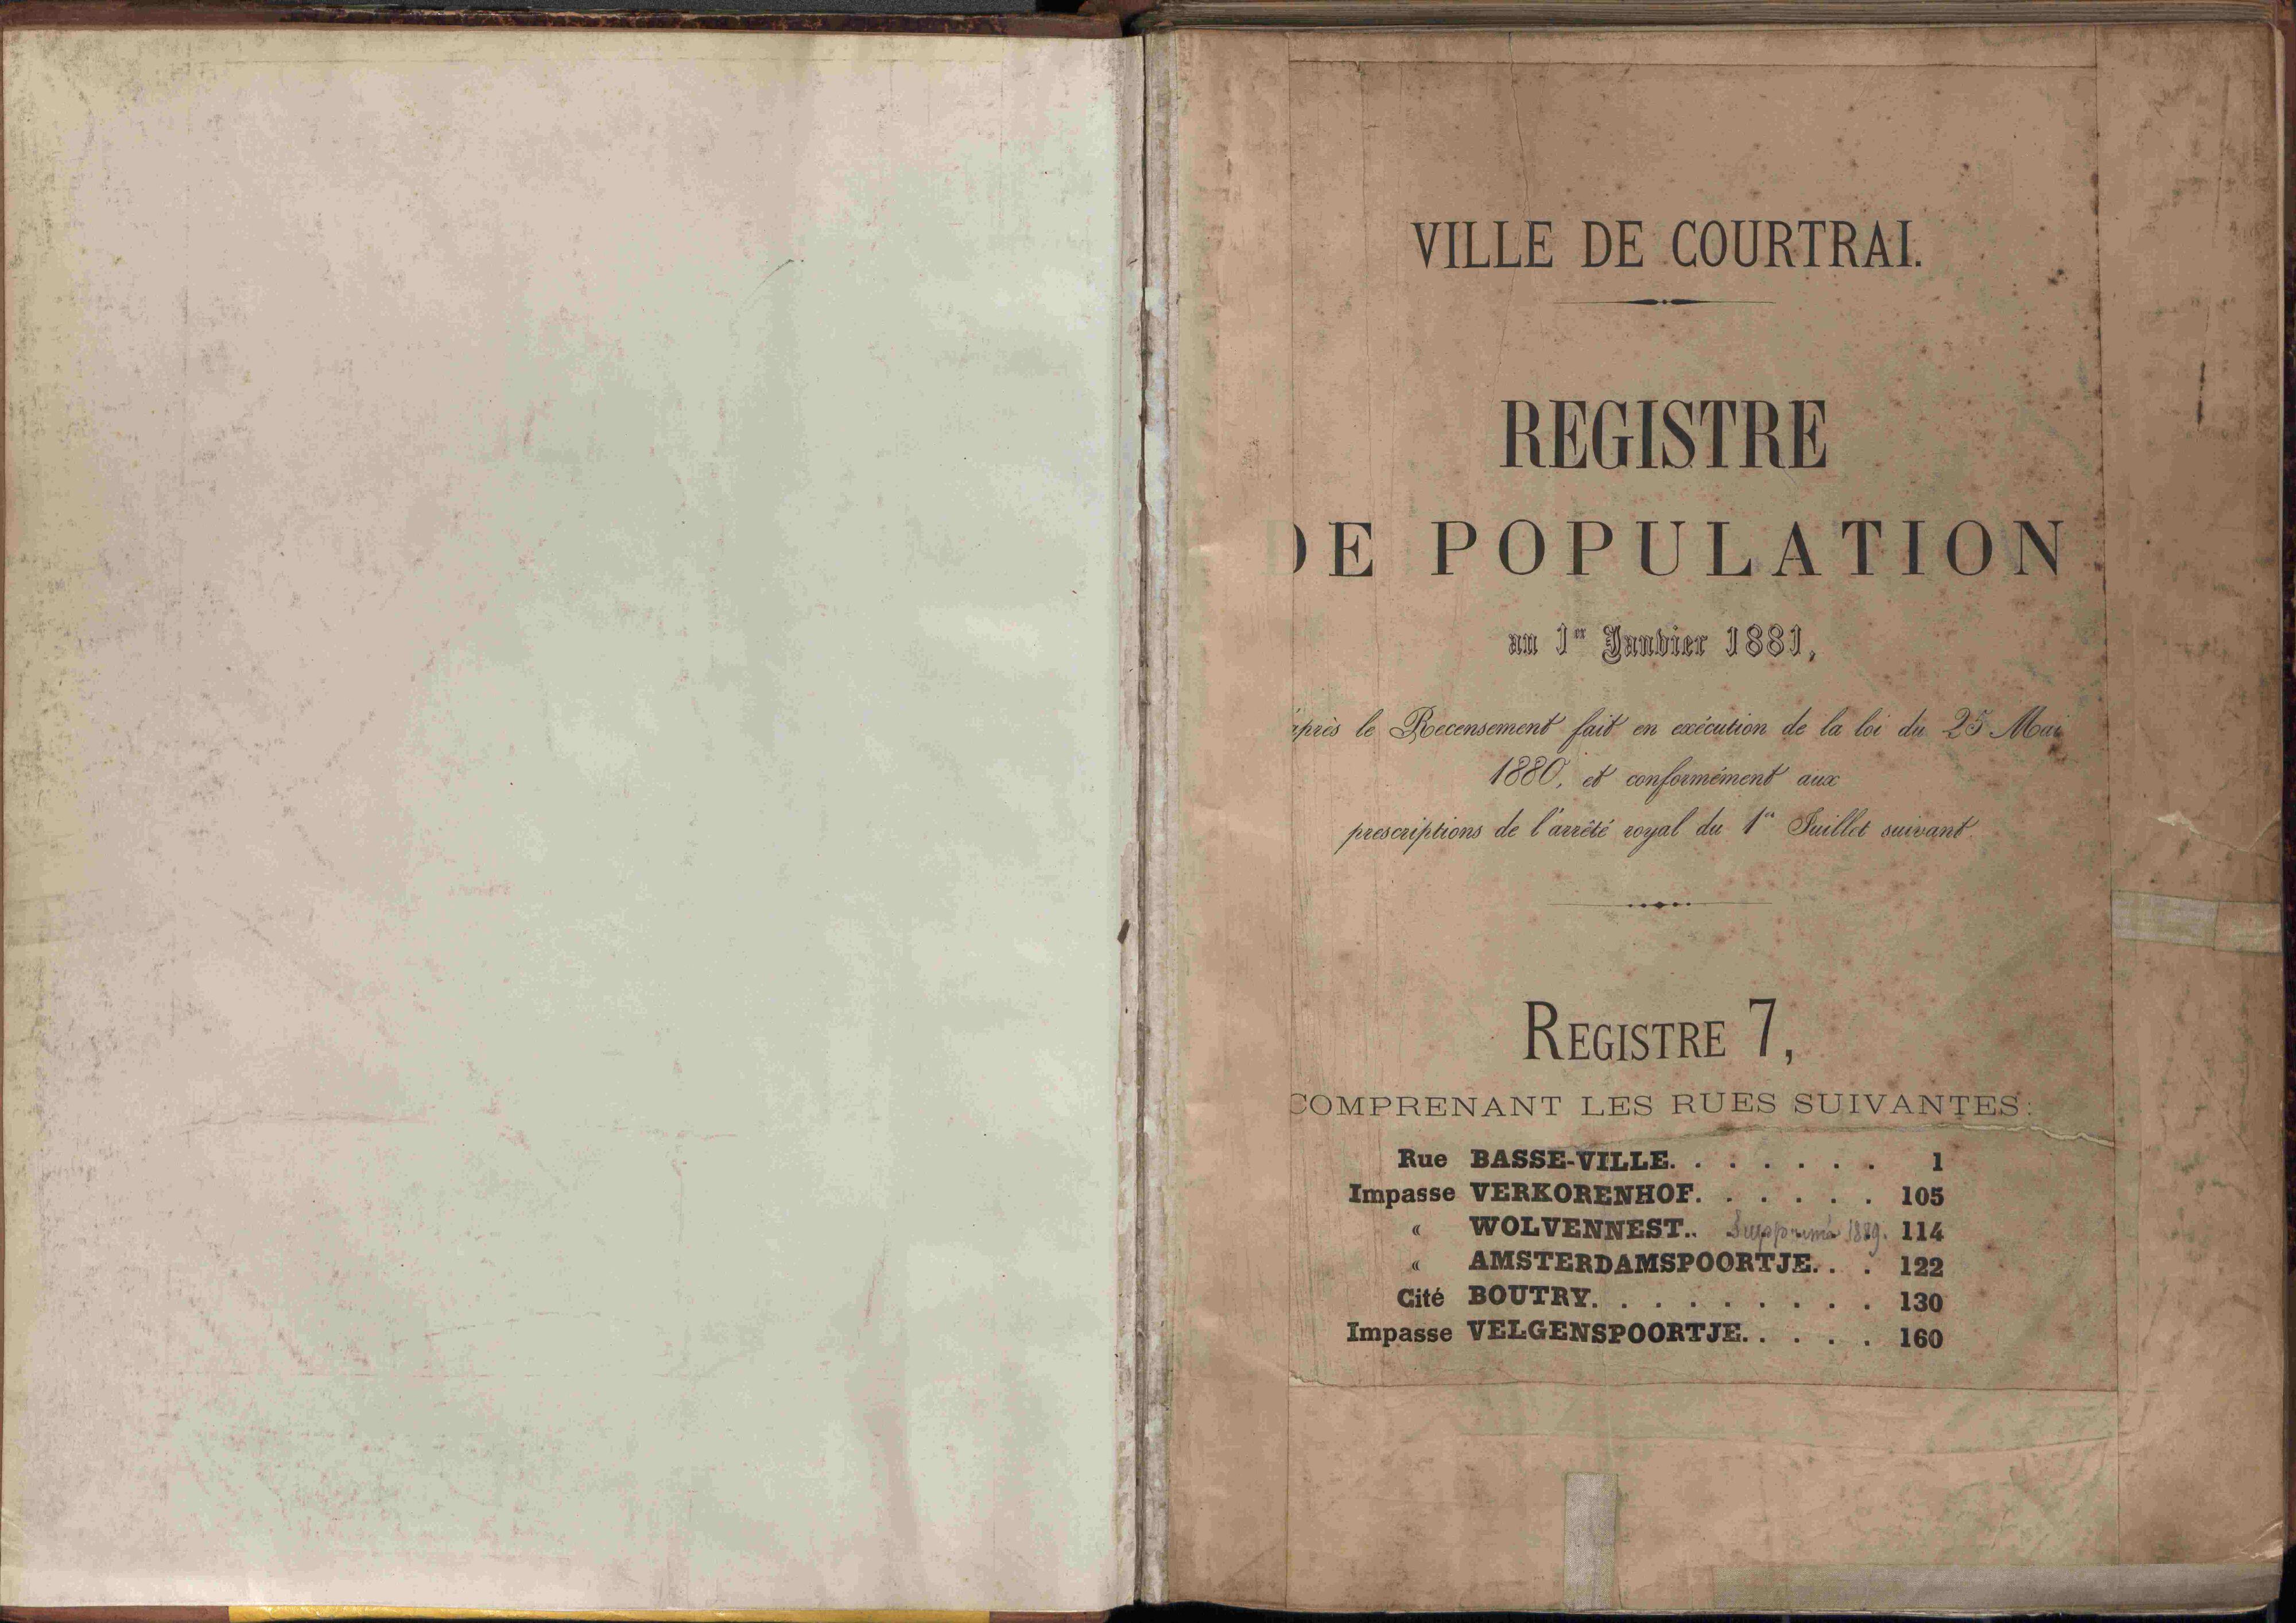 Bevolkingsregister Kortrijk 1880 boek 7